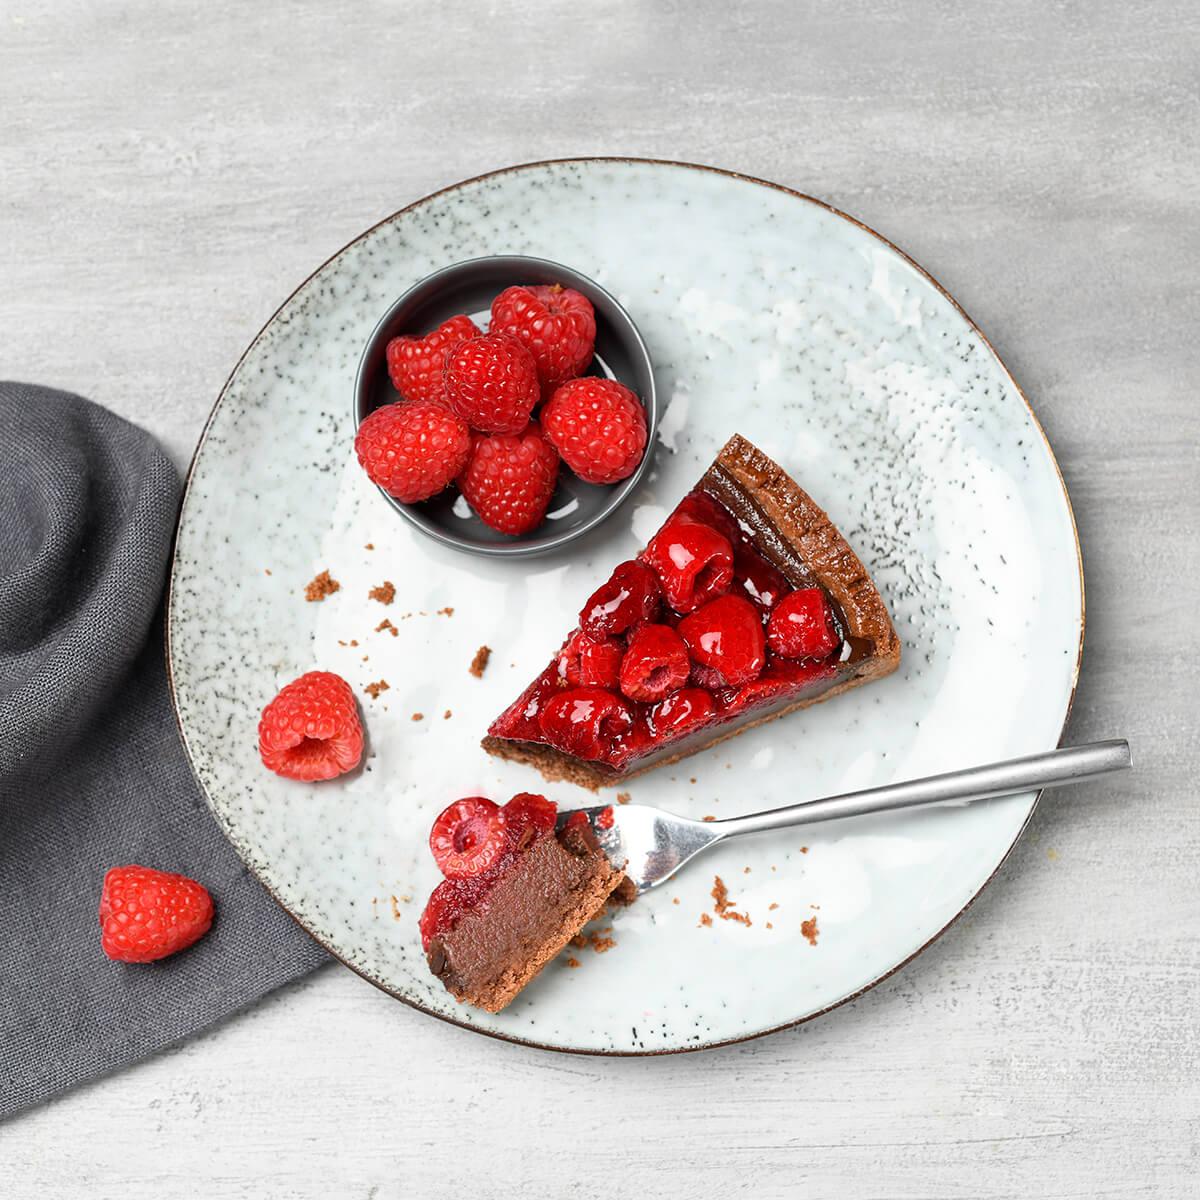 Himbeer Schoko Kuchen von Antje Plewinski Foodfotografie